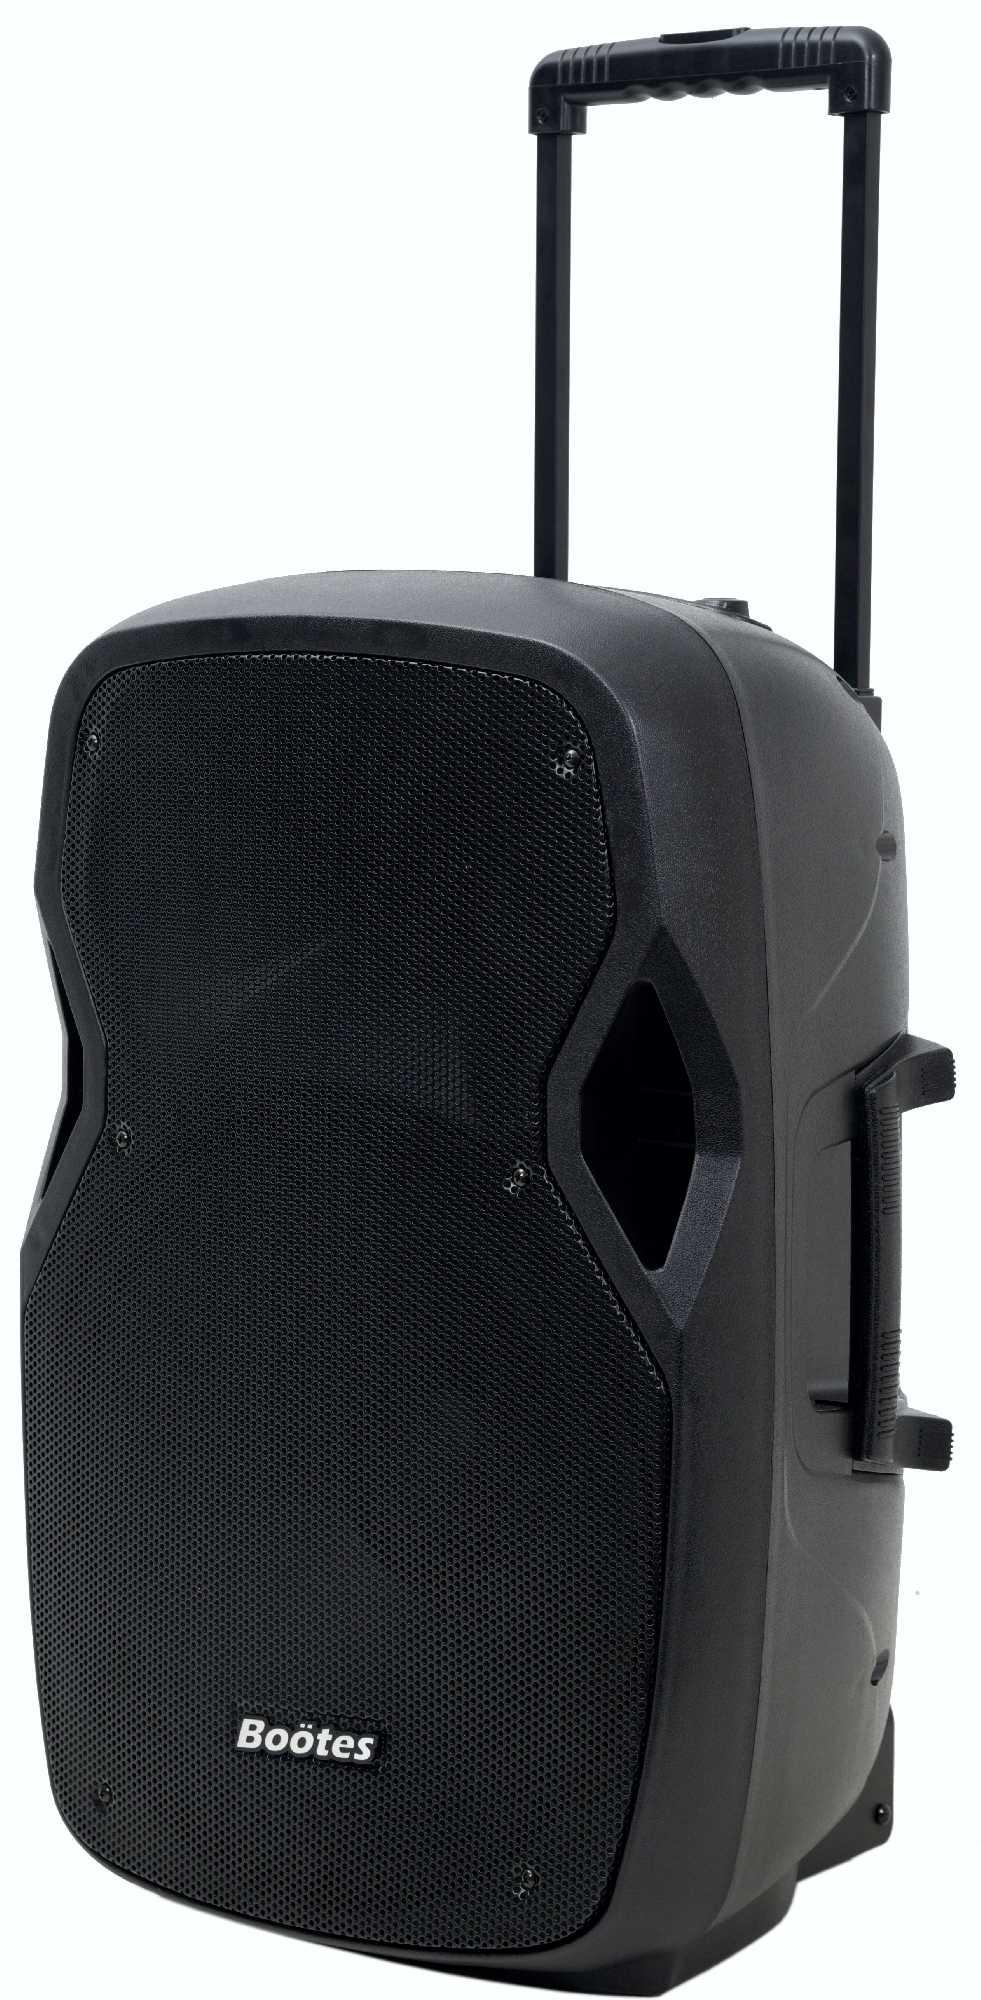 CAIXA DE SOM AMPLIF BOOTES BDA-1515B  AF 15 POL+DTI 420W MUS.  - Audio Video & cia